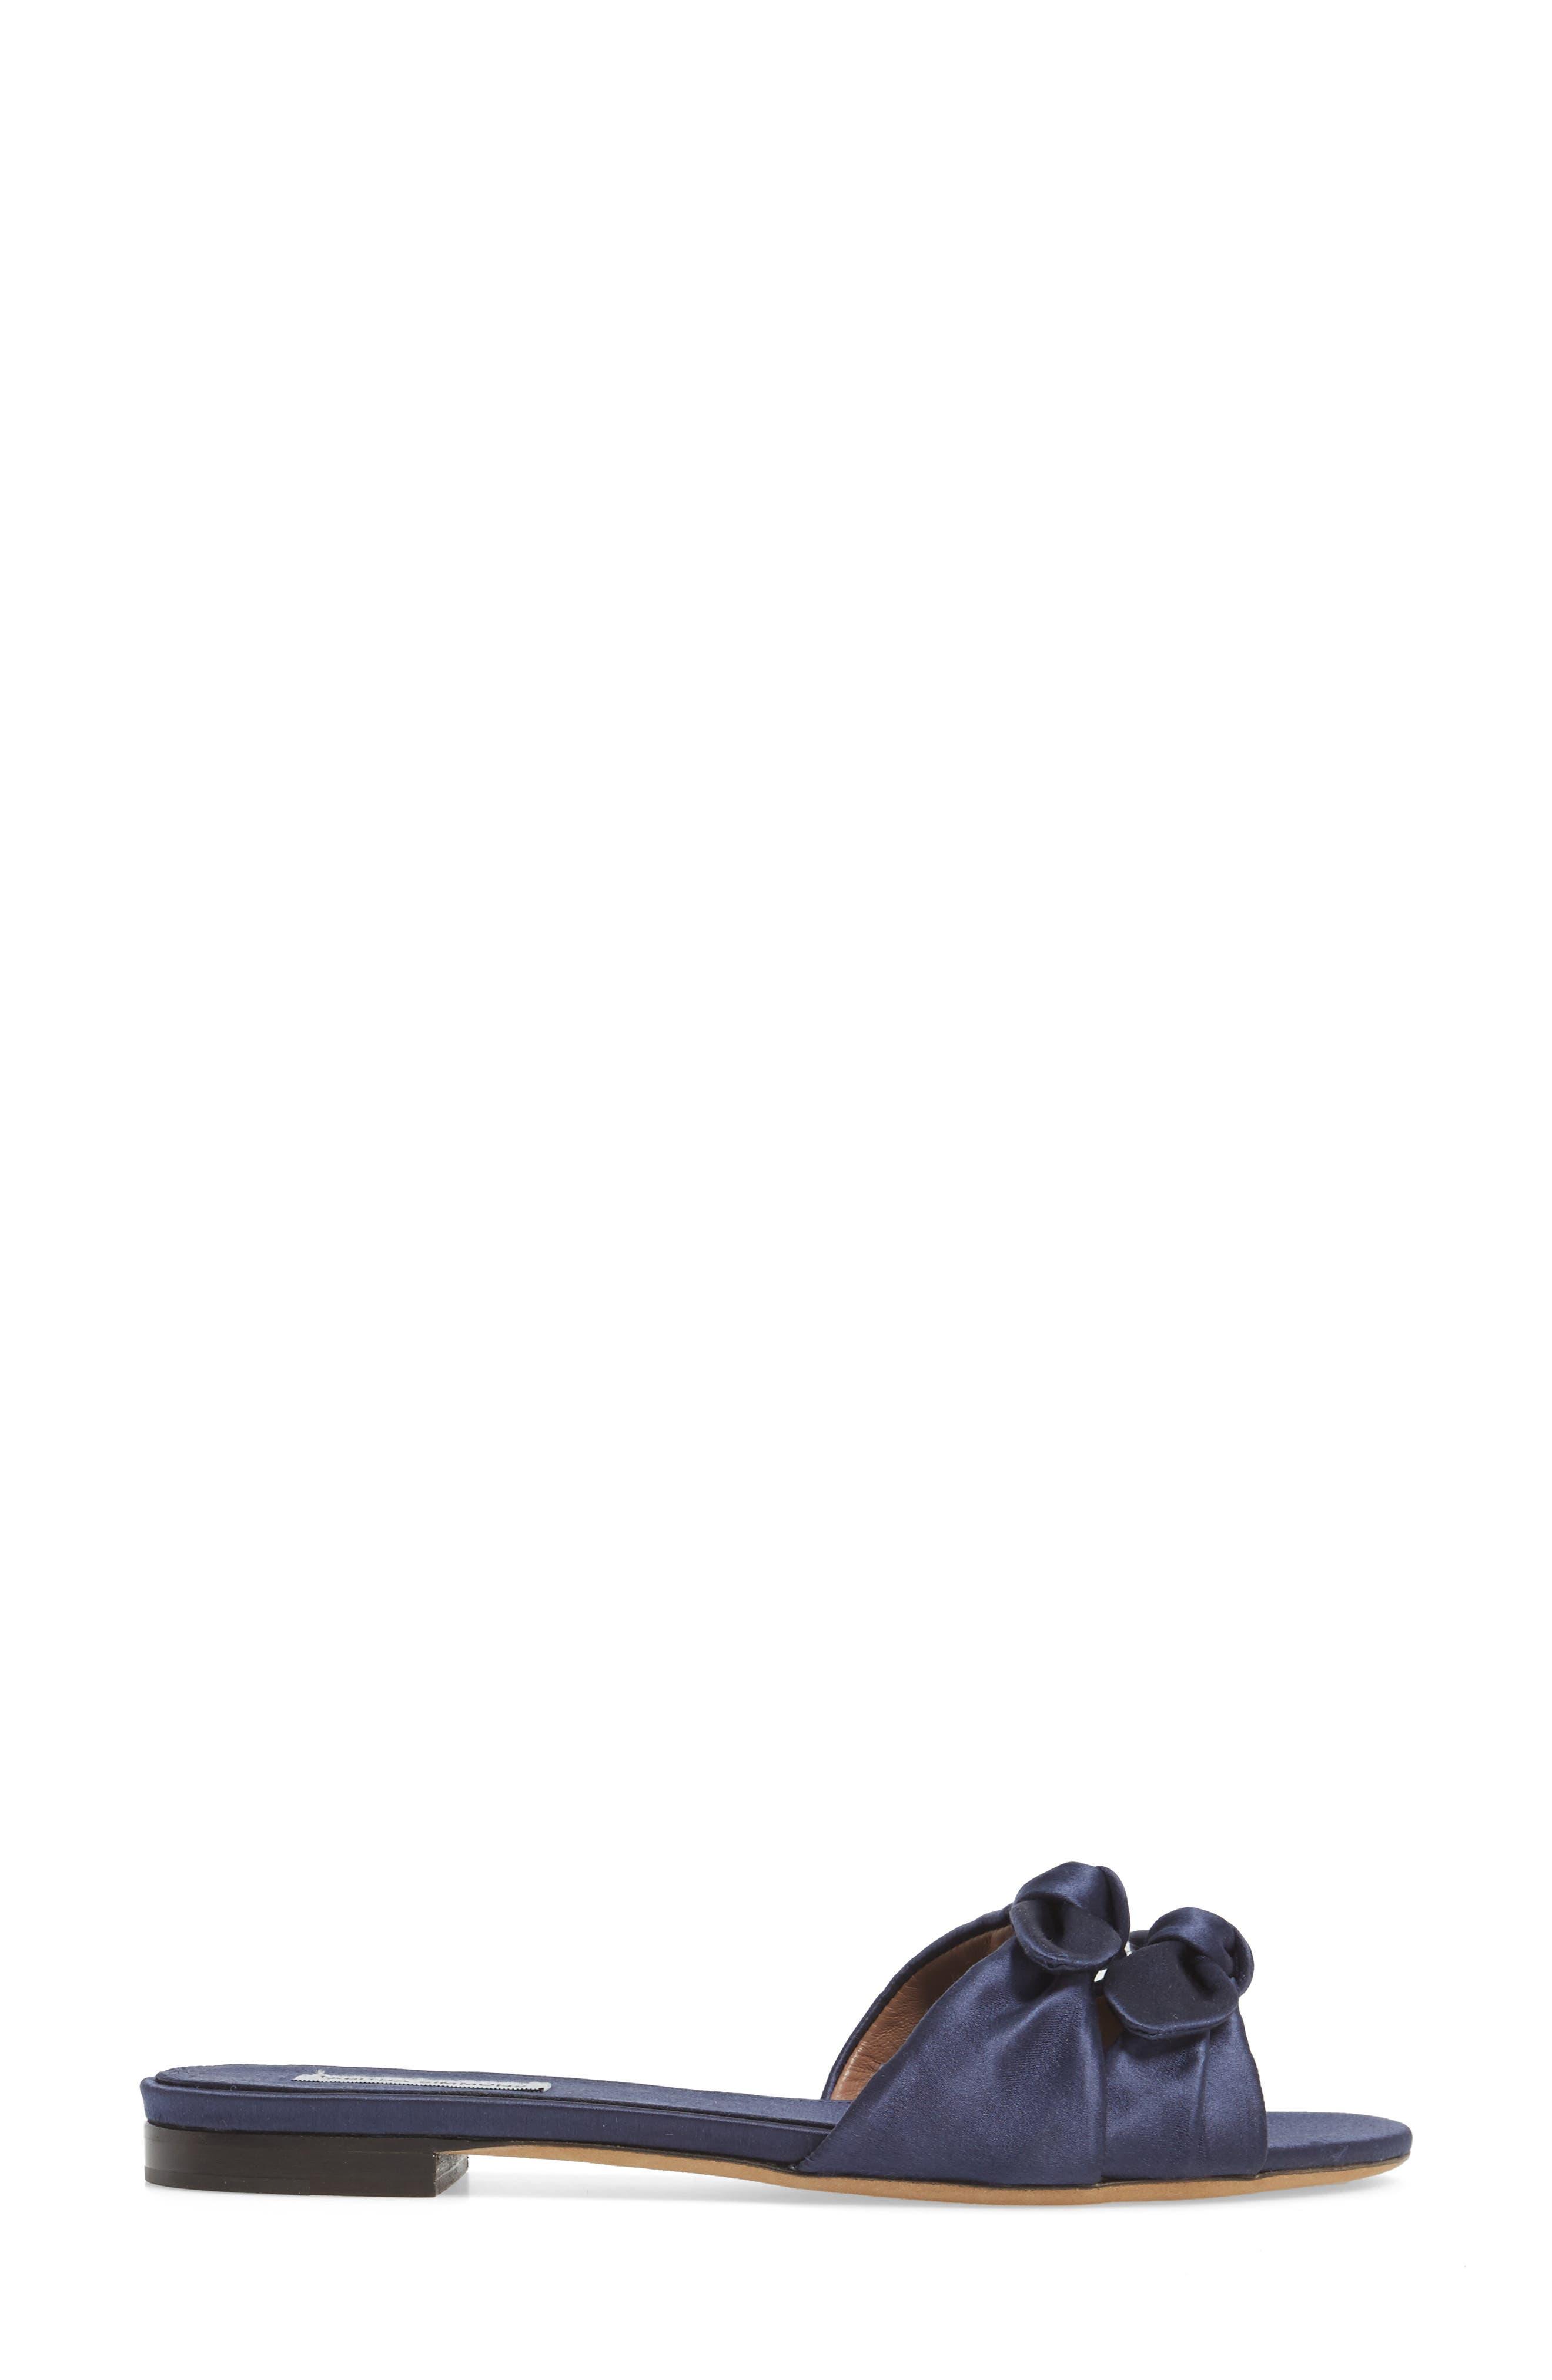 Cleo Knotted Bow Slide Sandal,                             Alternate thumbnail 3, color,                             Navy